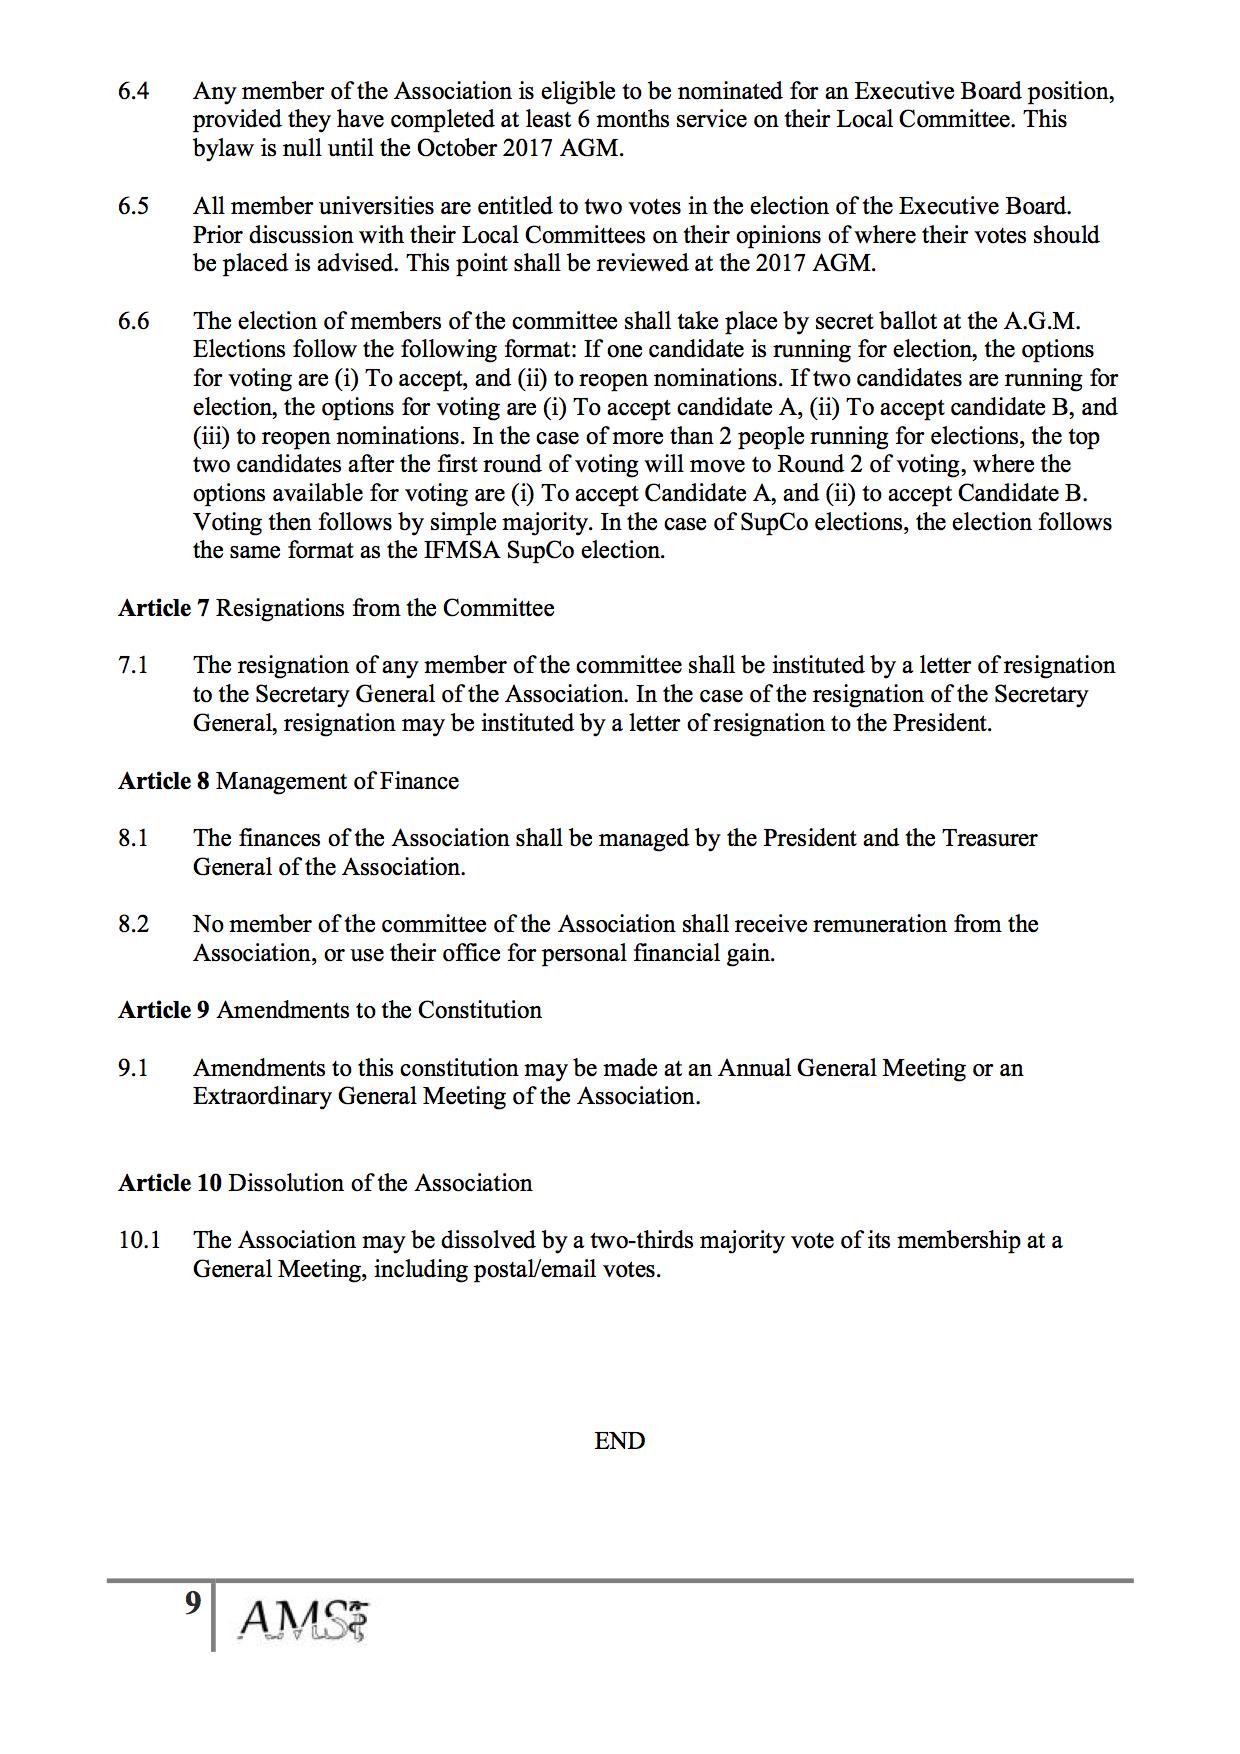 AMSI-FInal-Constitution 9.jpg